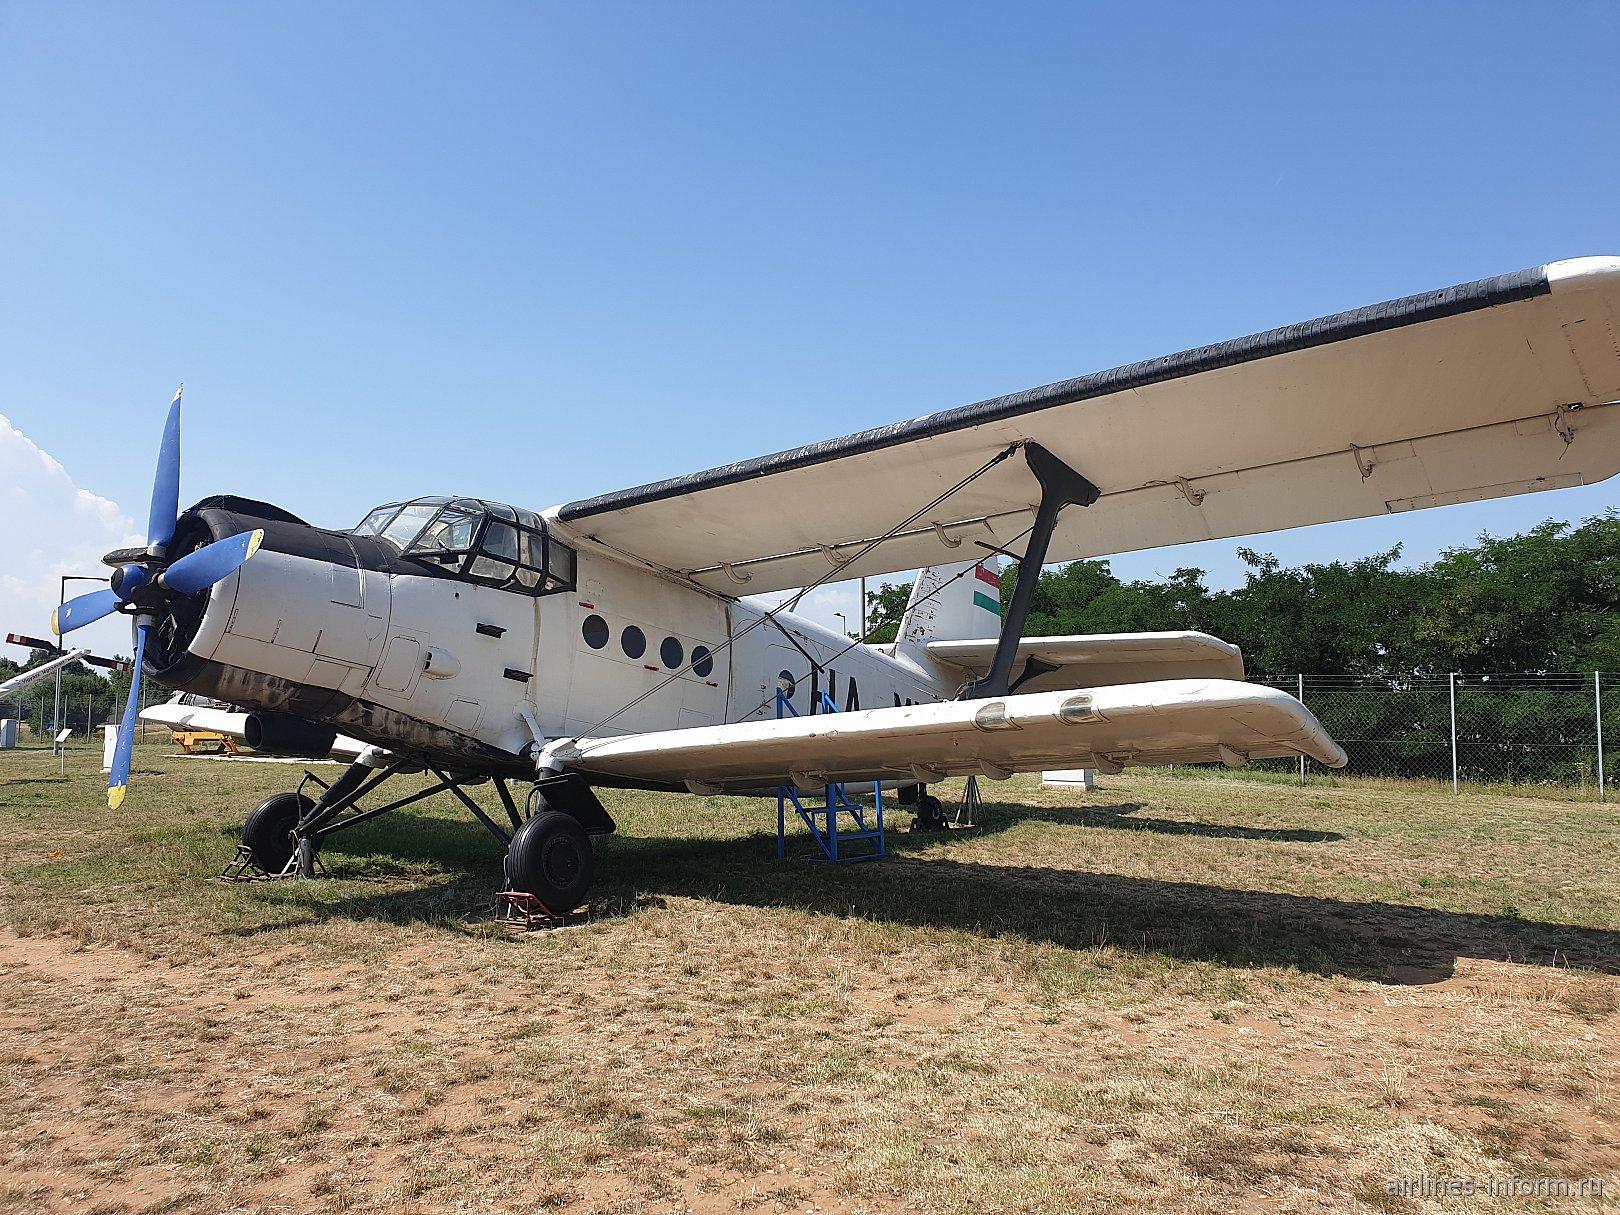 Самолет Ан-2 HA-MHI авиакомпании Malev в музее аэропорта Будапешта